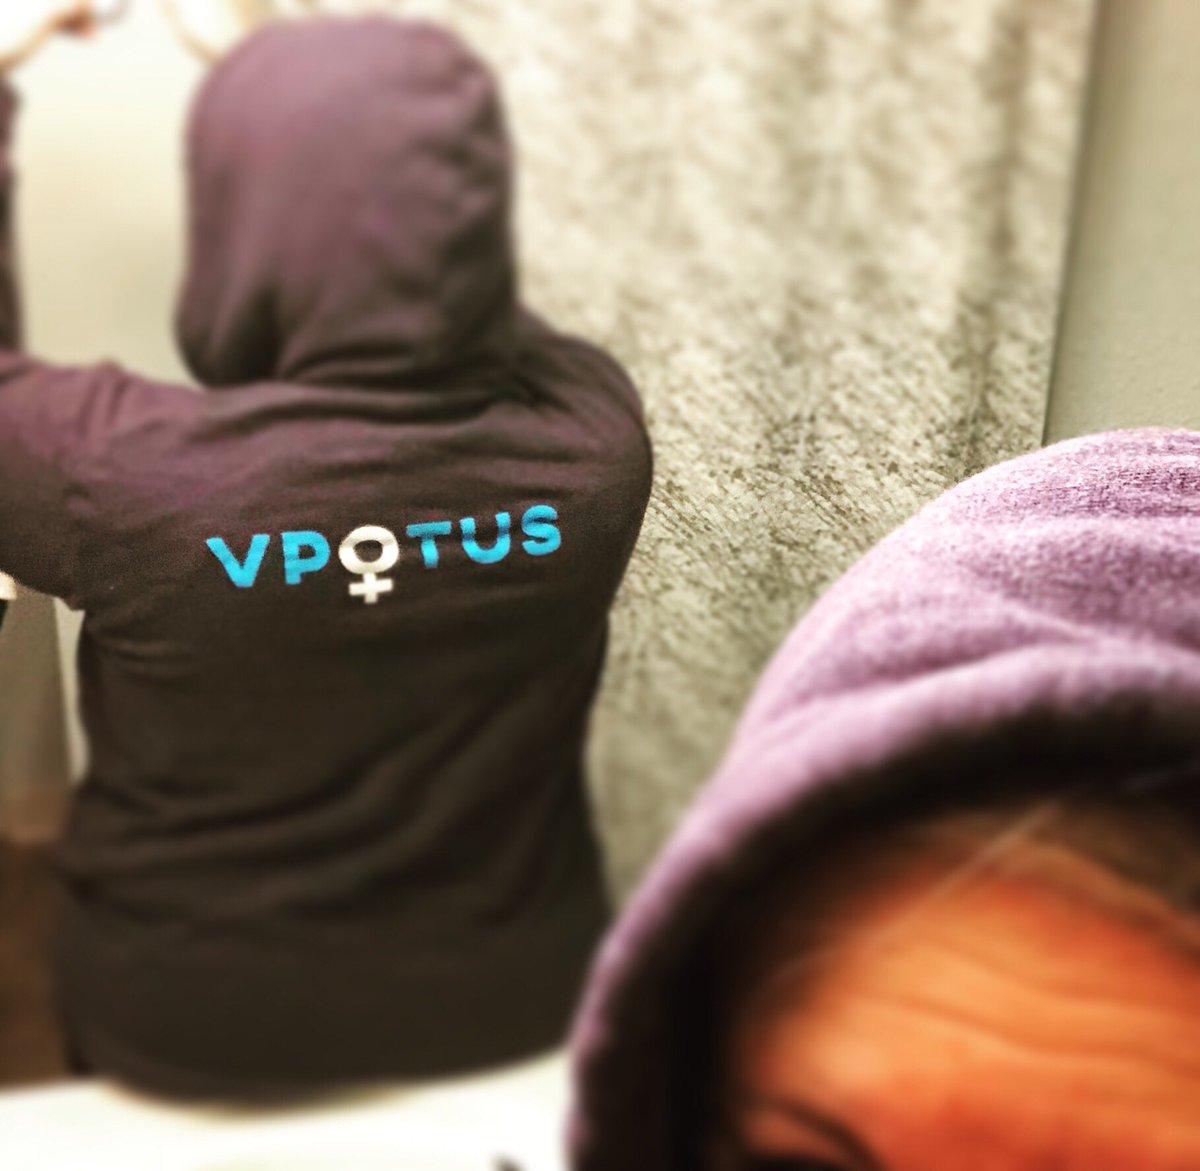 At long last, Happy Inauguration Day!  #VPOTUS #InaugurationDay